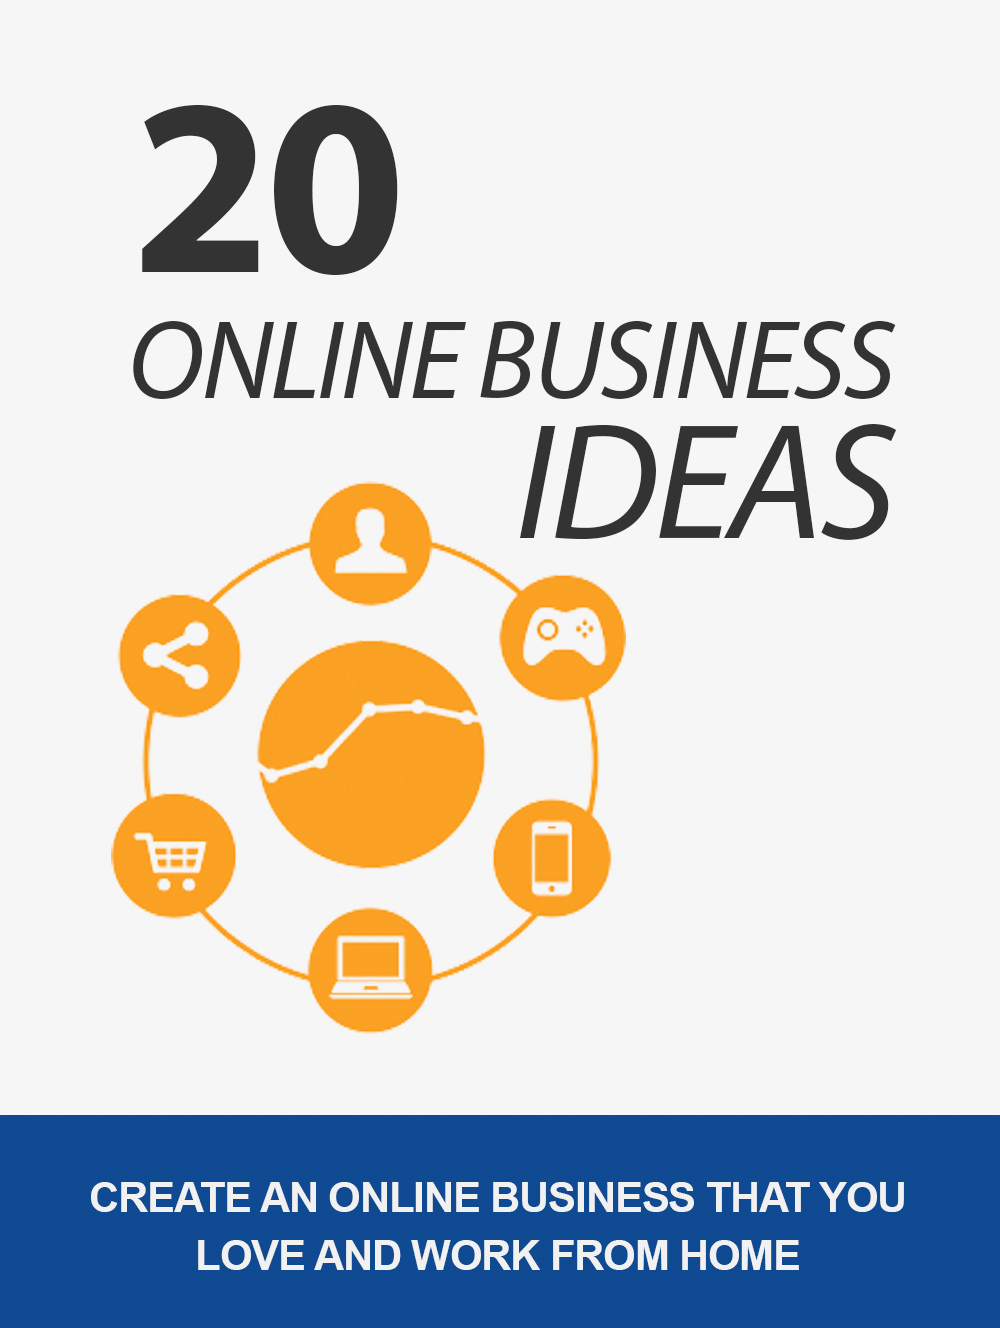 Online business idea for social marketing